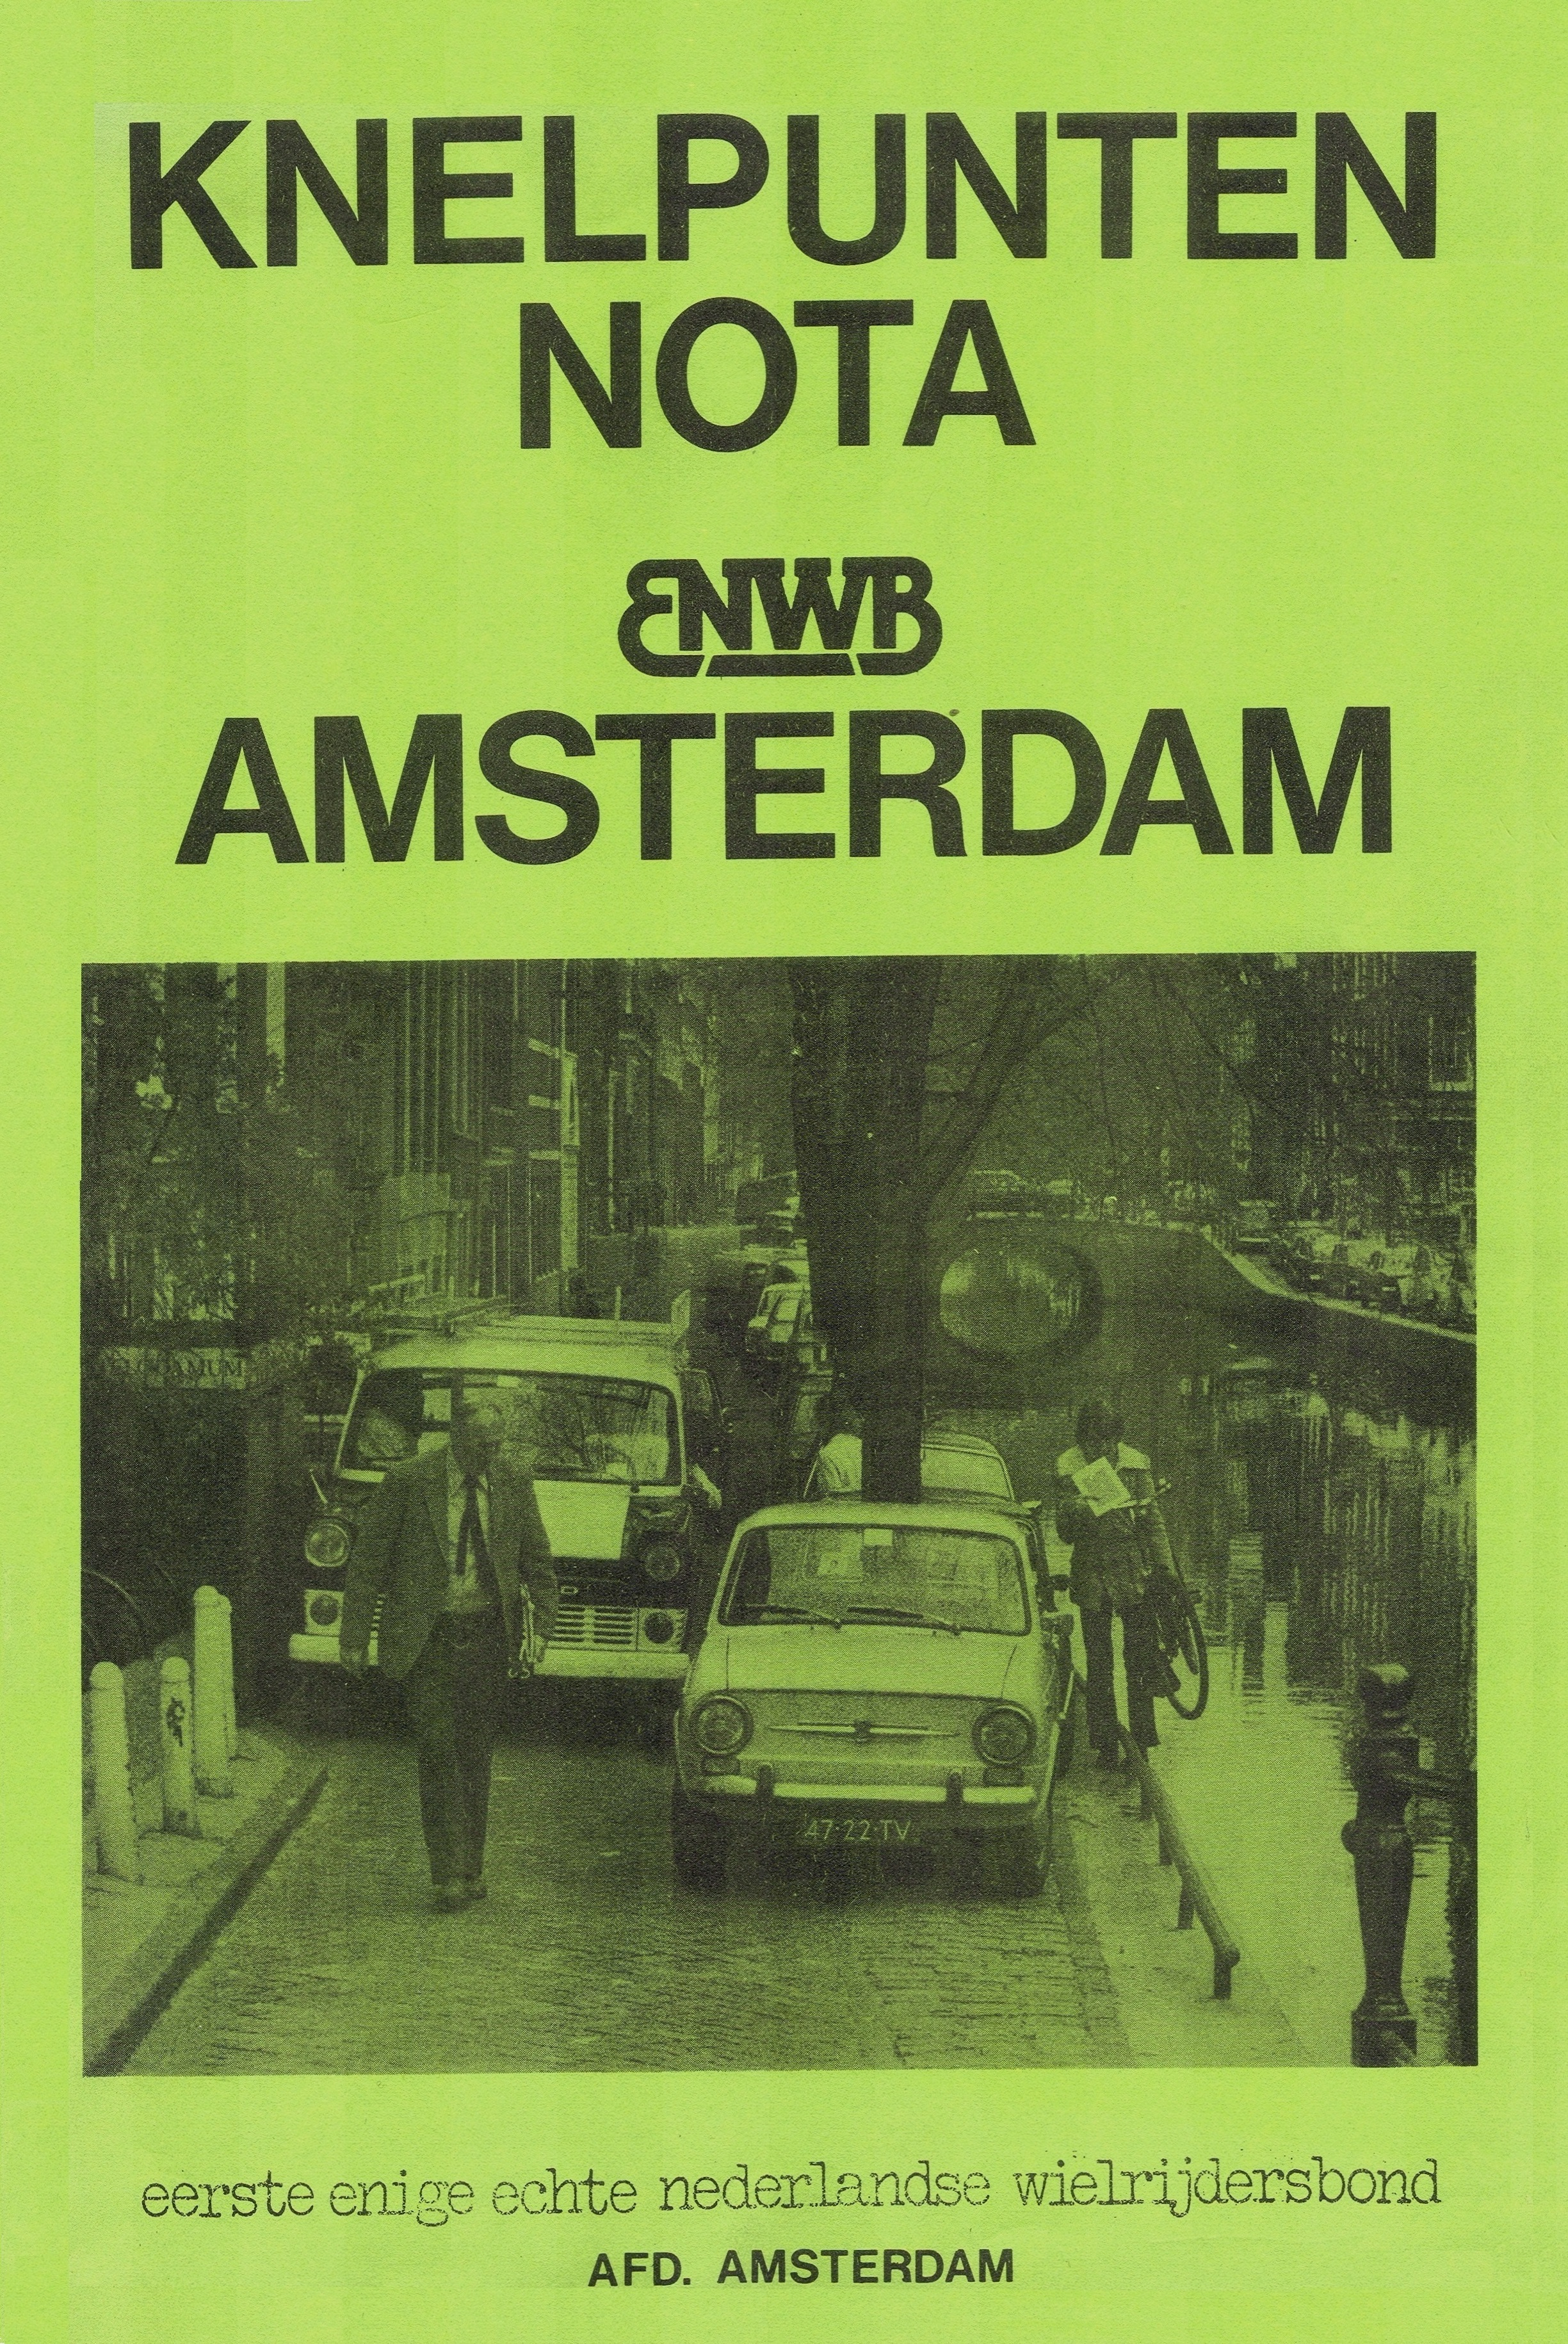 5. Knelpuntennota 1977 voorkant